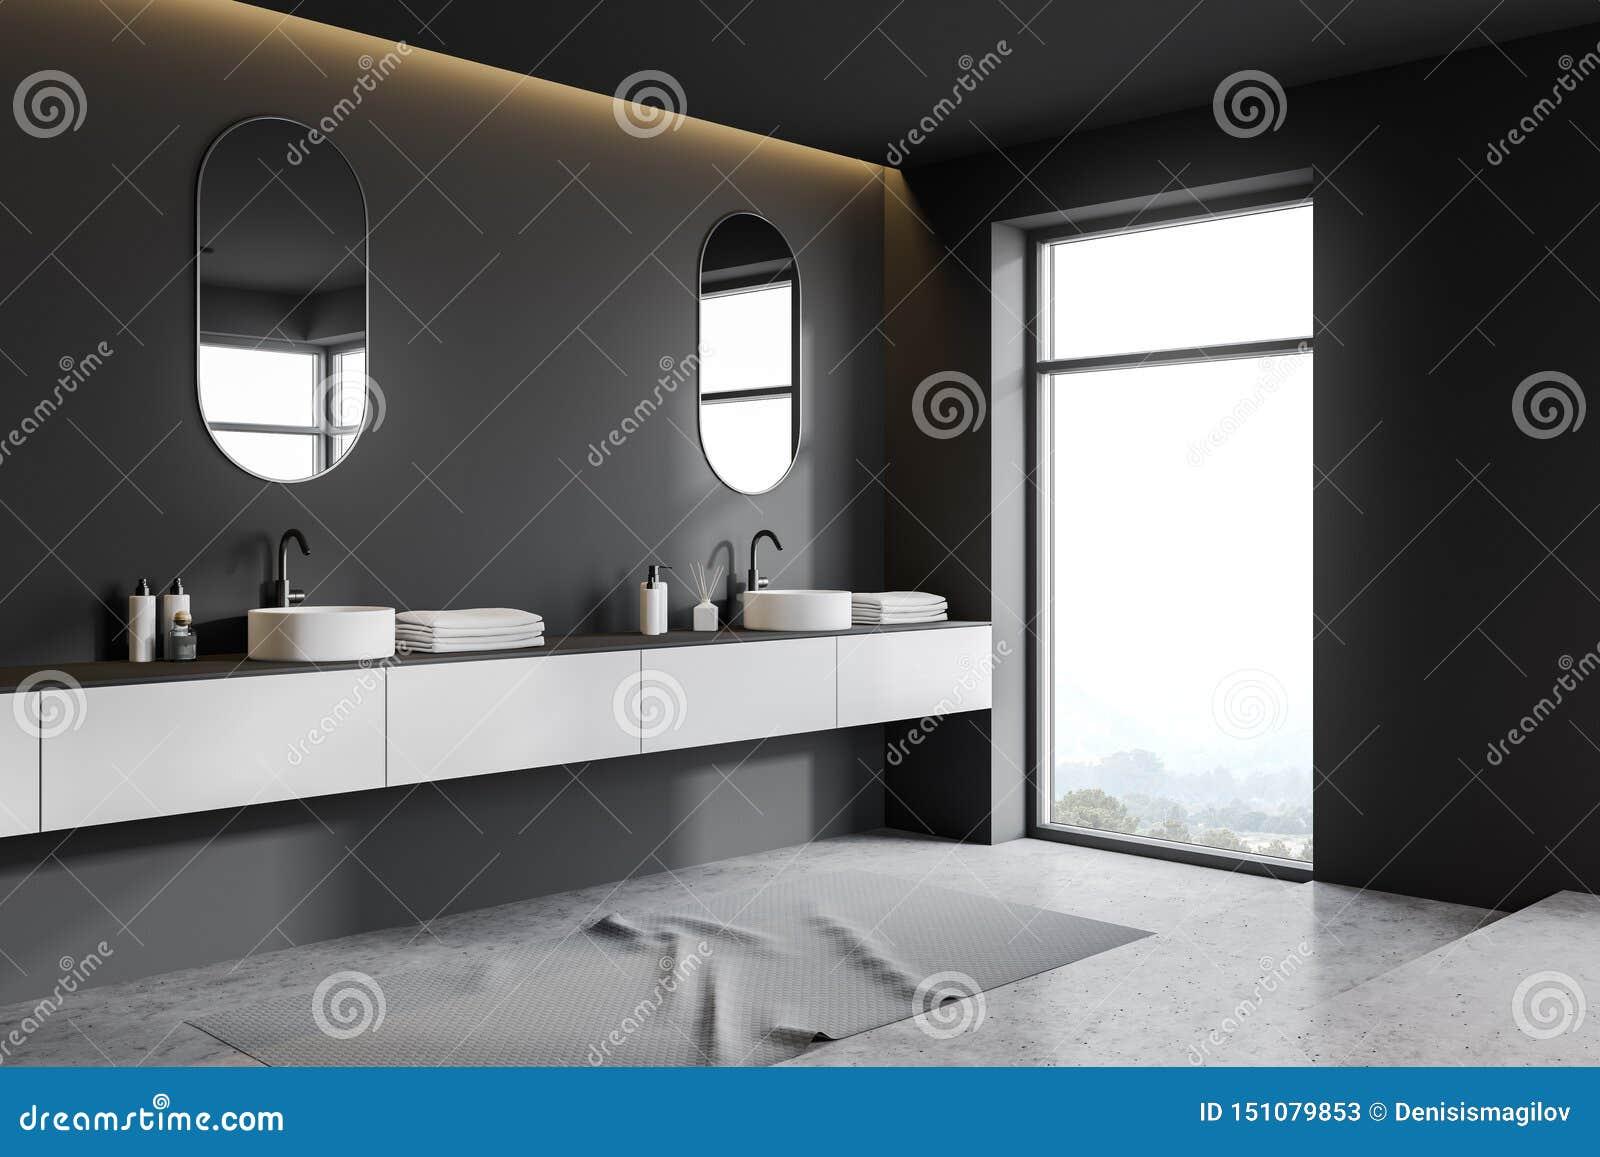 Gray Bathroom Corner Double Sink Stock Illustration Illustration Of Construction Architecture 151079853